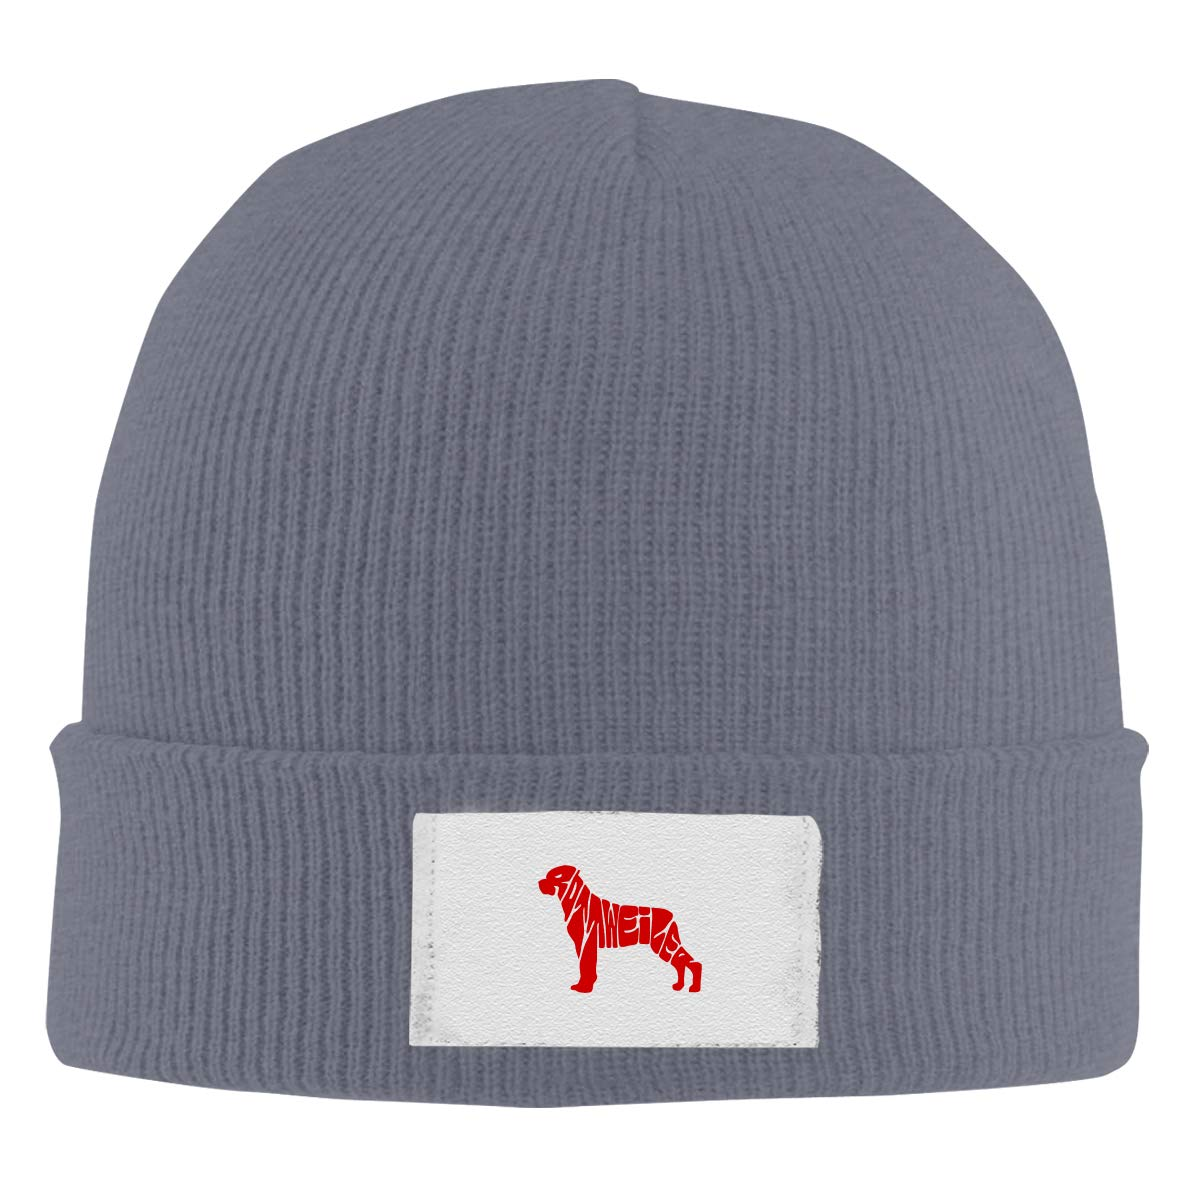 Dunpaiaa Skull Caps Rottweiler Cute Logo Winter Warm Knit Hats Stretchy Cuff Beanie Hat Black